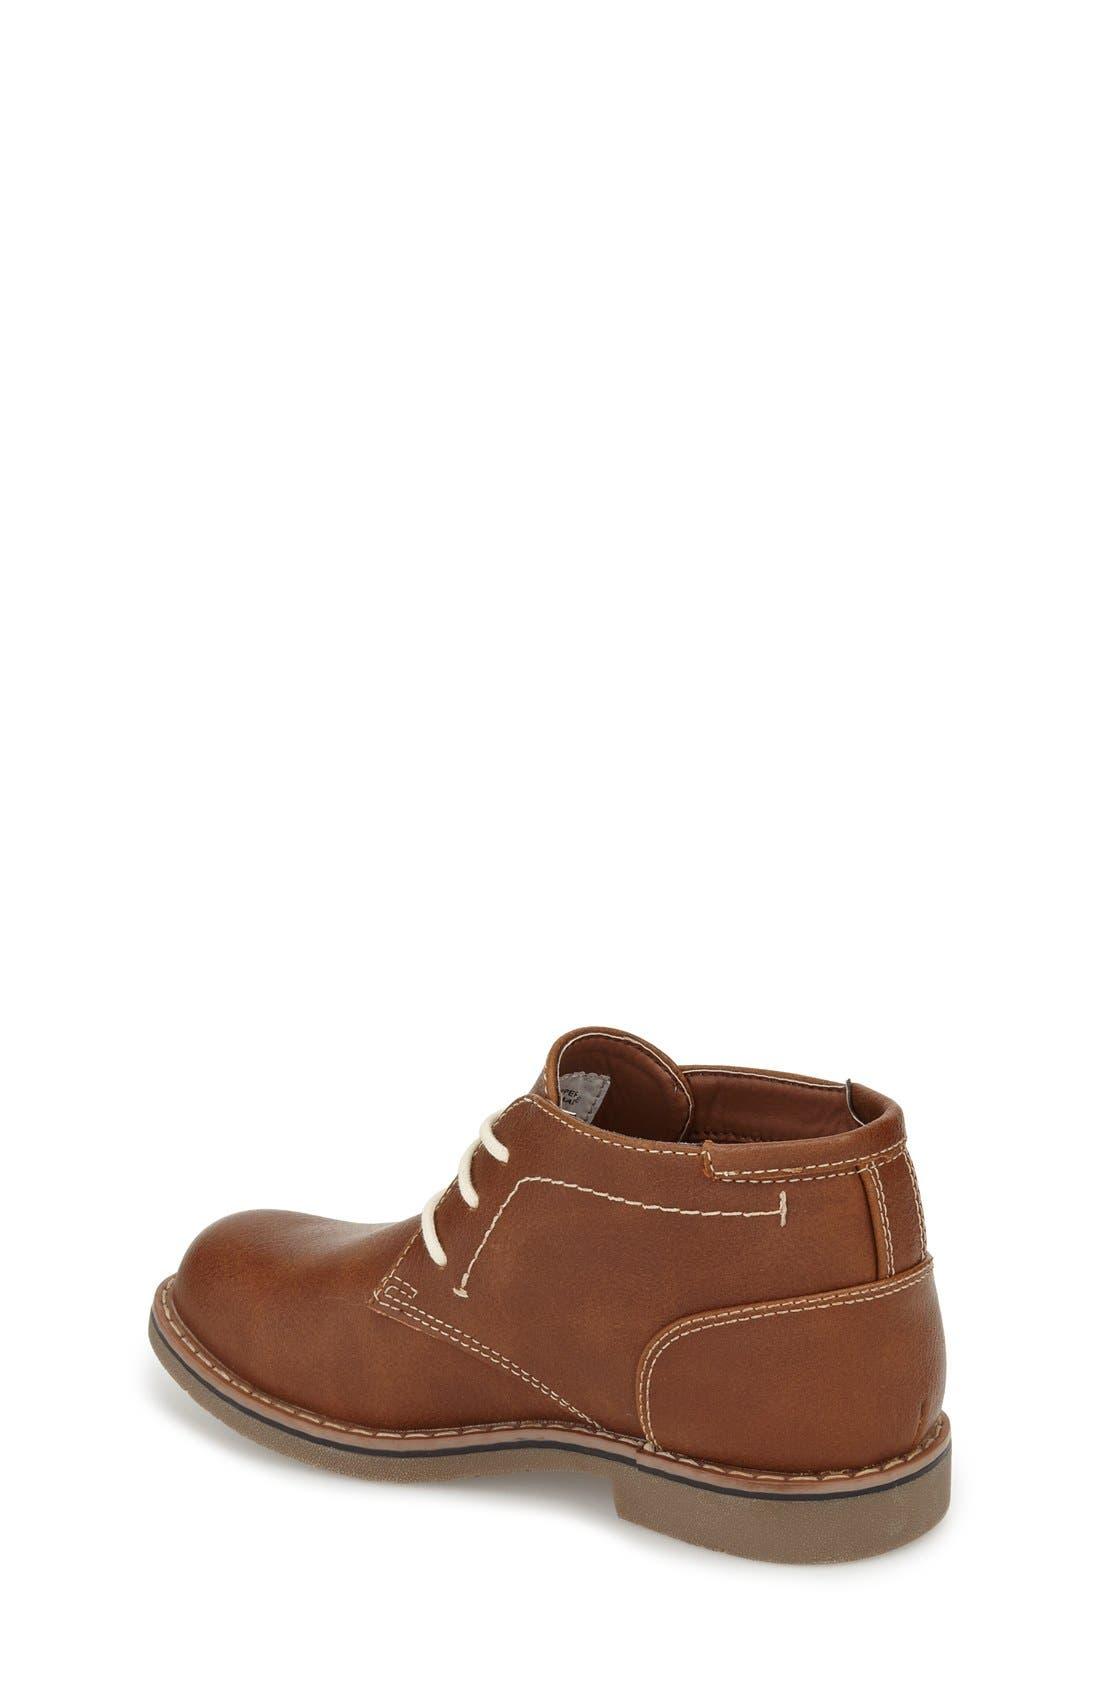 Classic Chukka Boot,                             Alternate thumbnail 2, color,                             Cognac Faux Leather